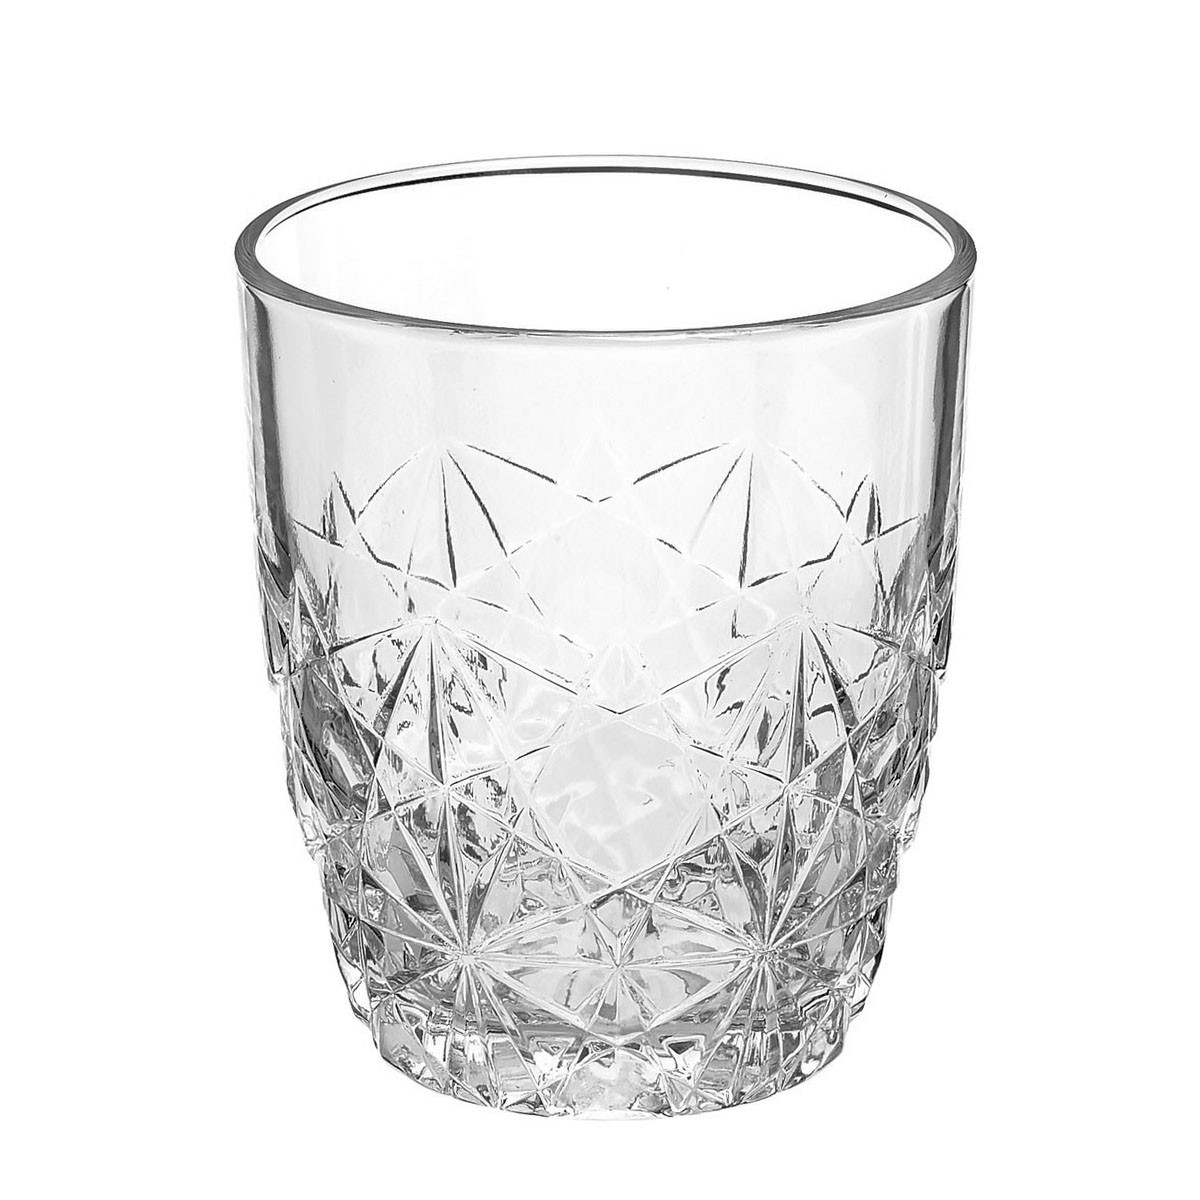 Стаканы (3шт) DEDALO для виски 260 мл BORMIOLI ROCCO 220590qn2021990